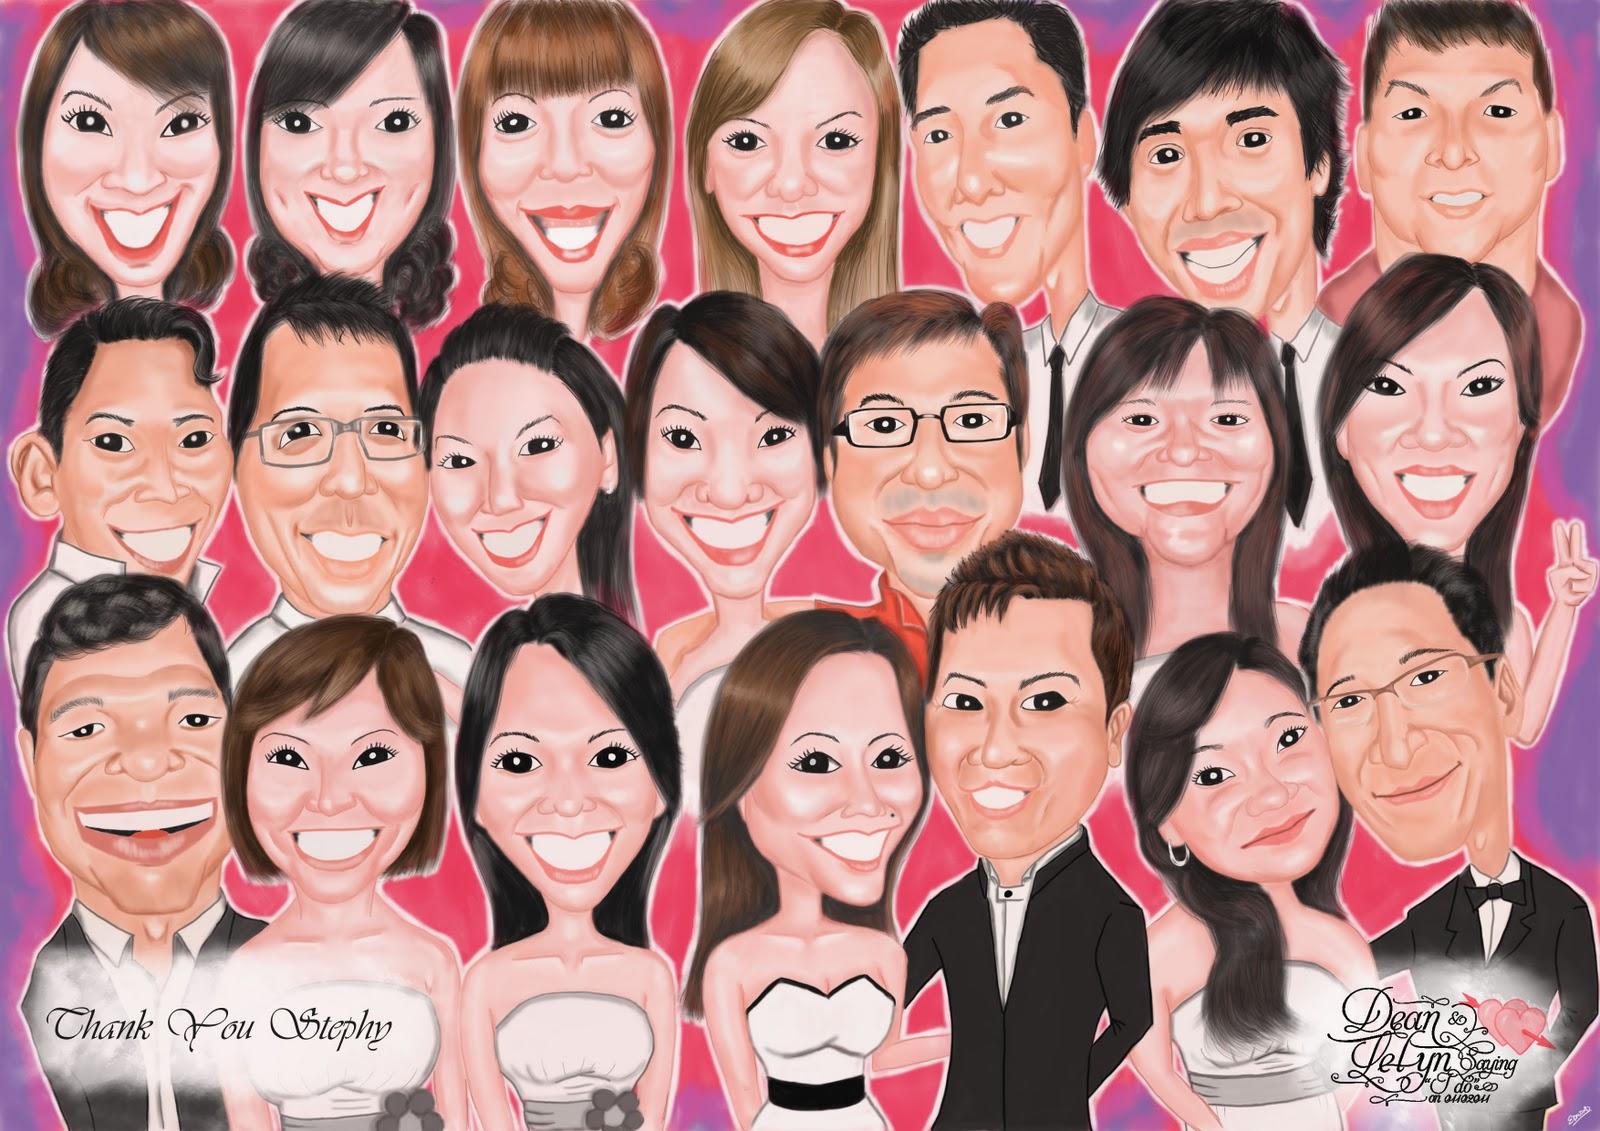 Edmonds Art A Group Caricature Gift For Lelyns Wedding Helpers 1